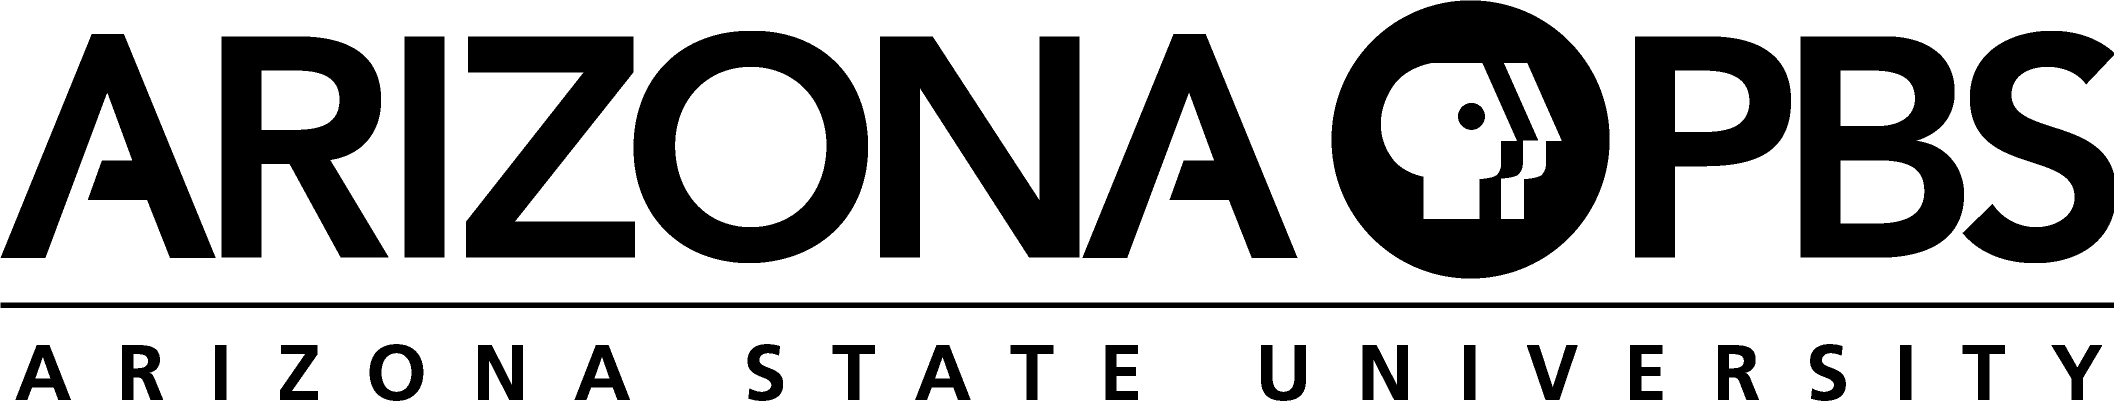 Eight logo15